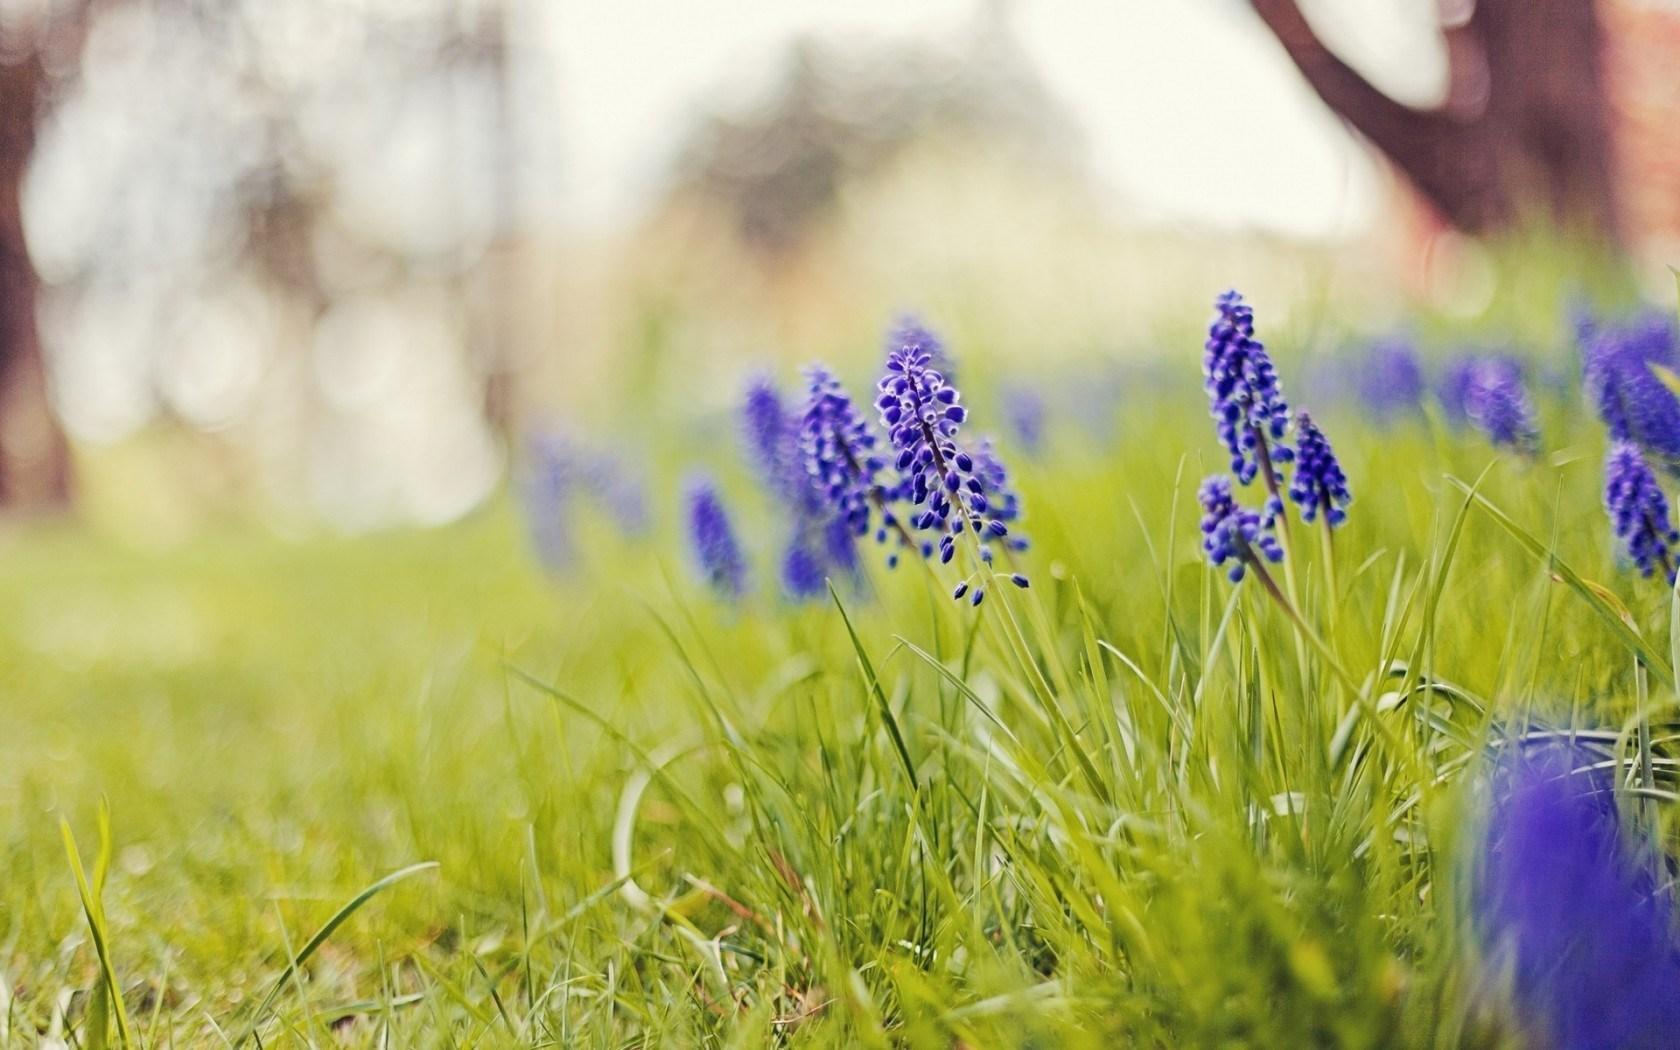 hyacinth flowers grass nature